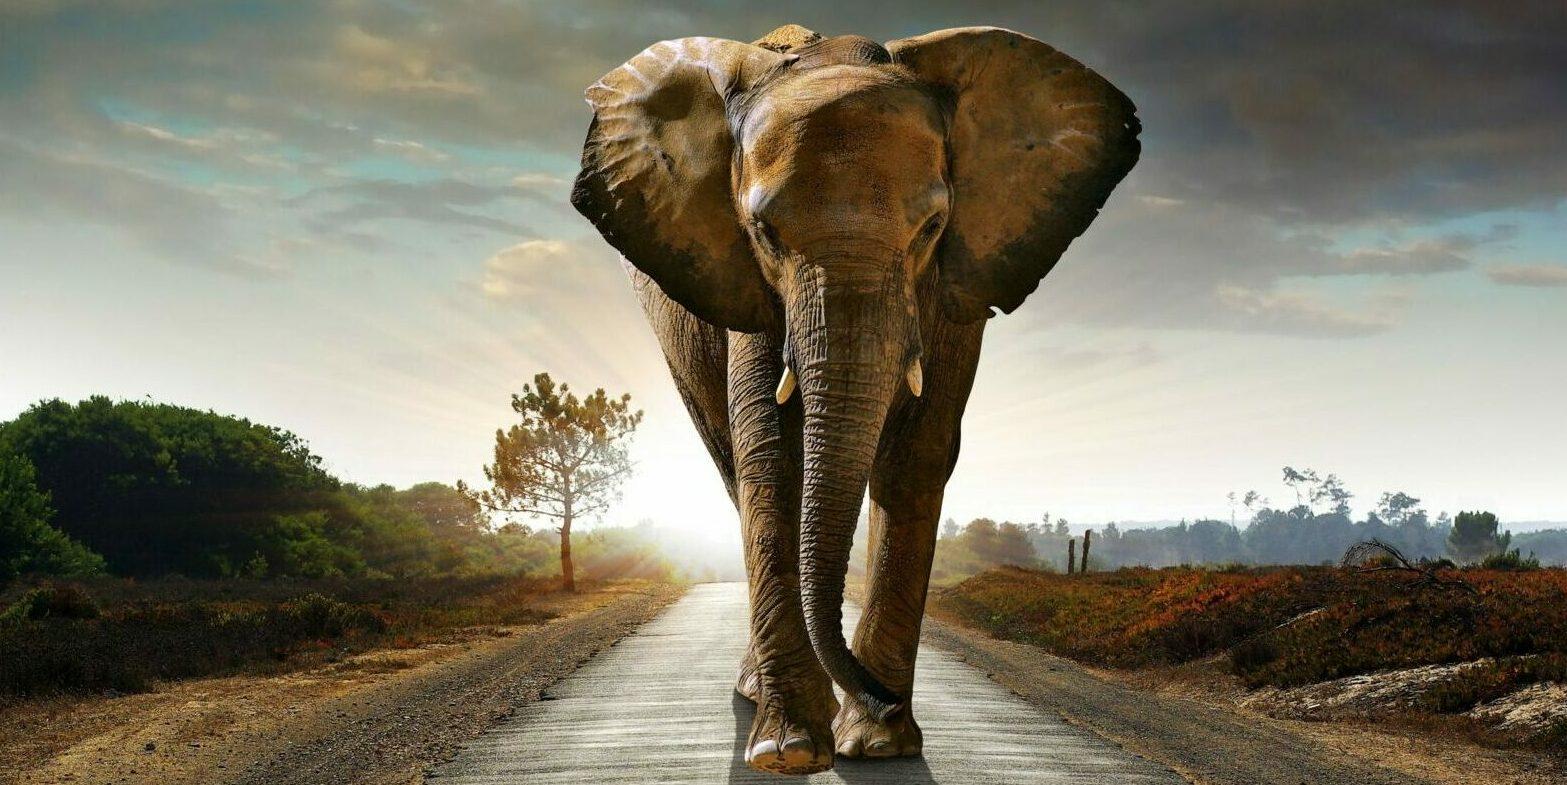 Elephant walking on road to illustrate blog about breaking bad habits | Vanguard Communications | Denver, CO